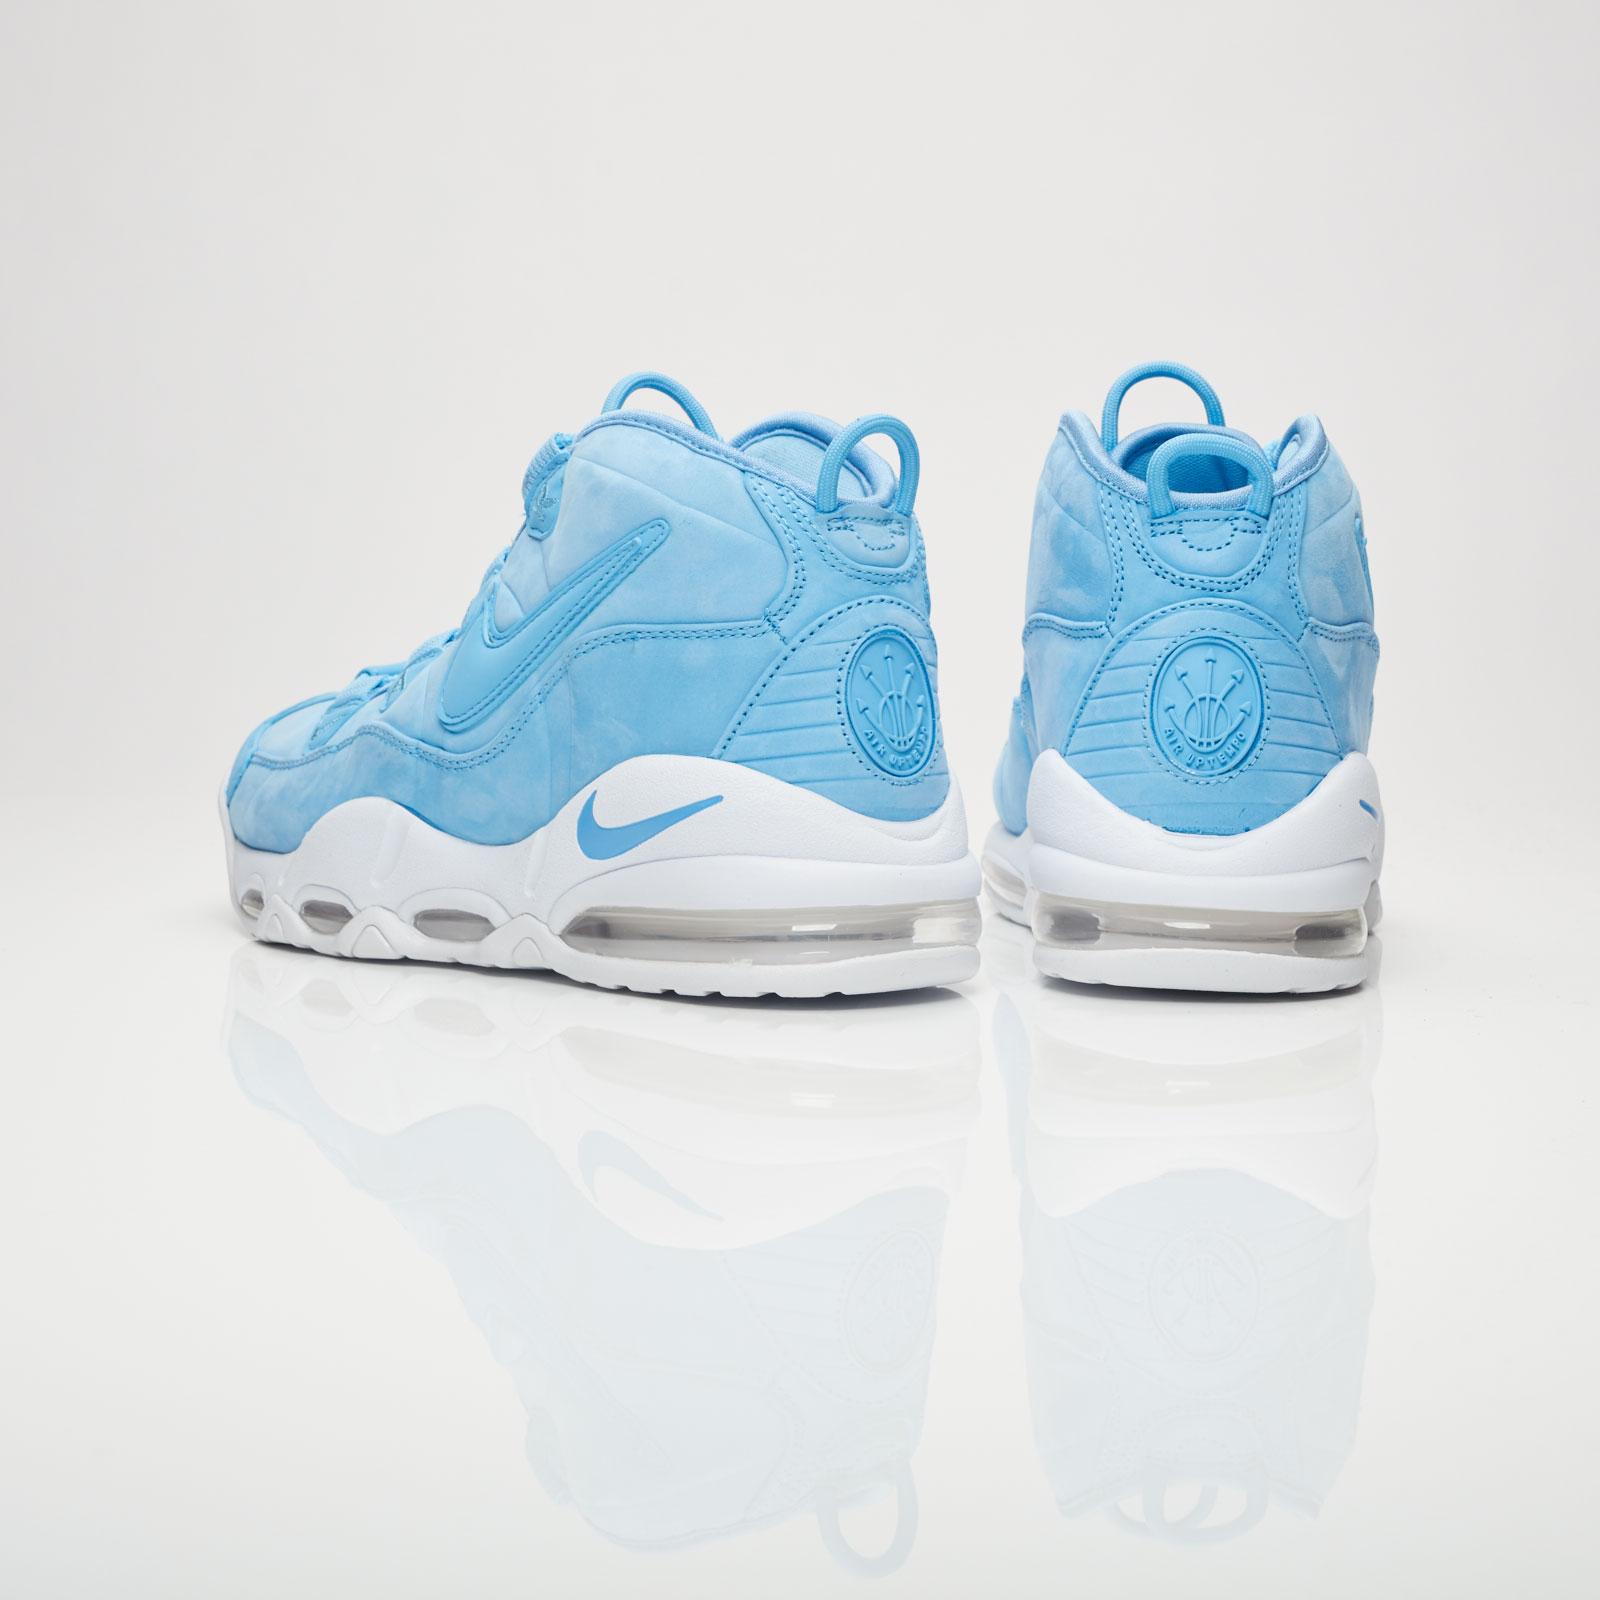 best service 9db41 f0a2d ... Nike Sportswear Air Max Uptempo 95 As Qs ...